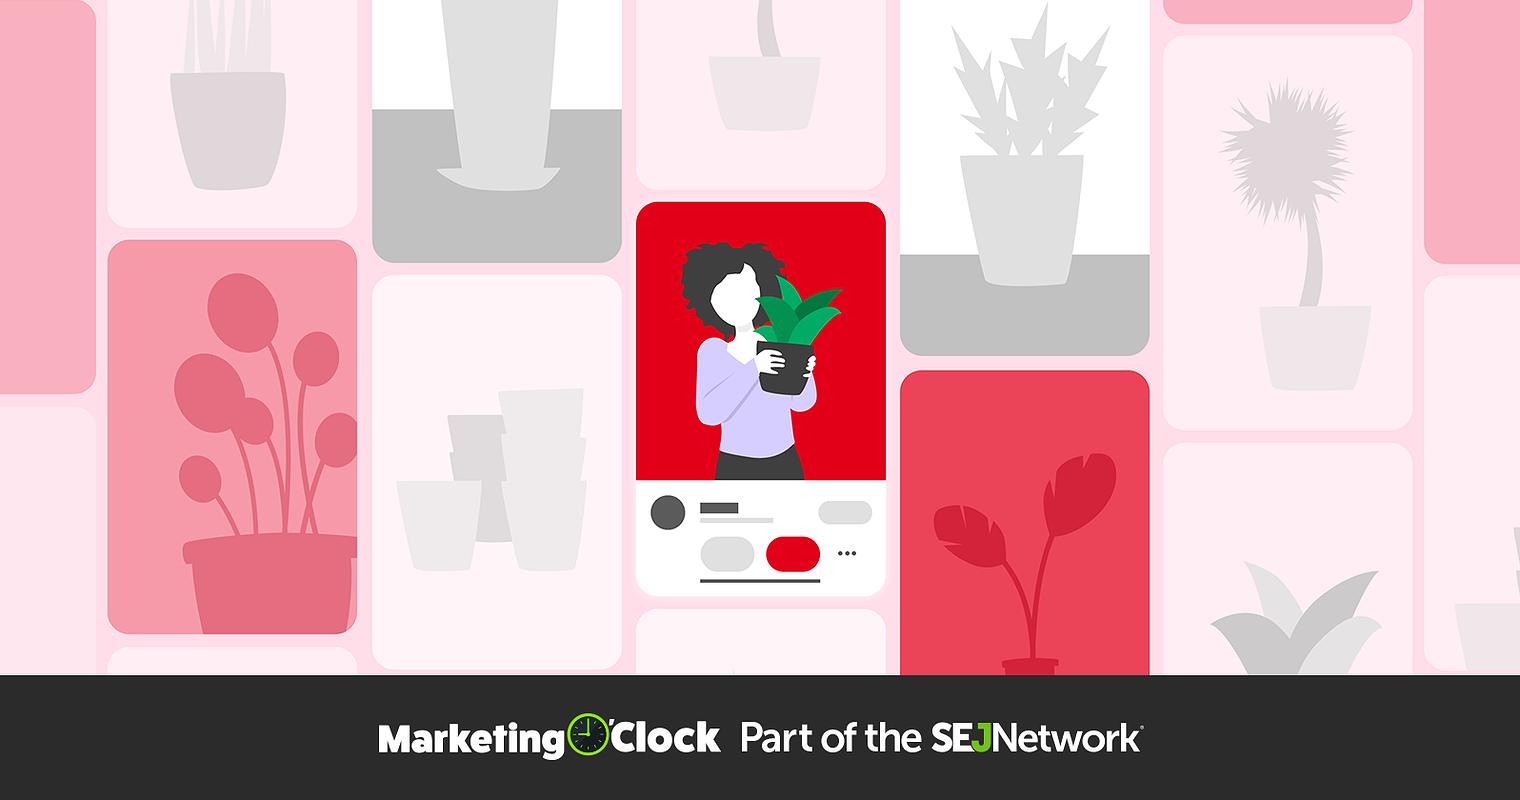 Pinterest's New Feature & Tools, Plus Digital Marketing News [PODCAST]